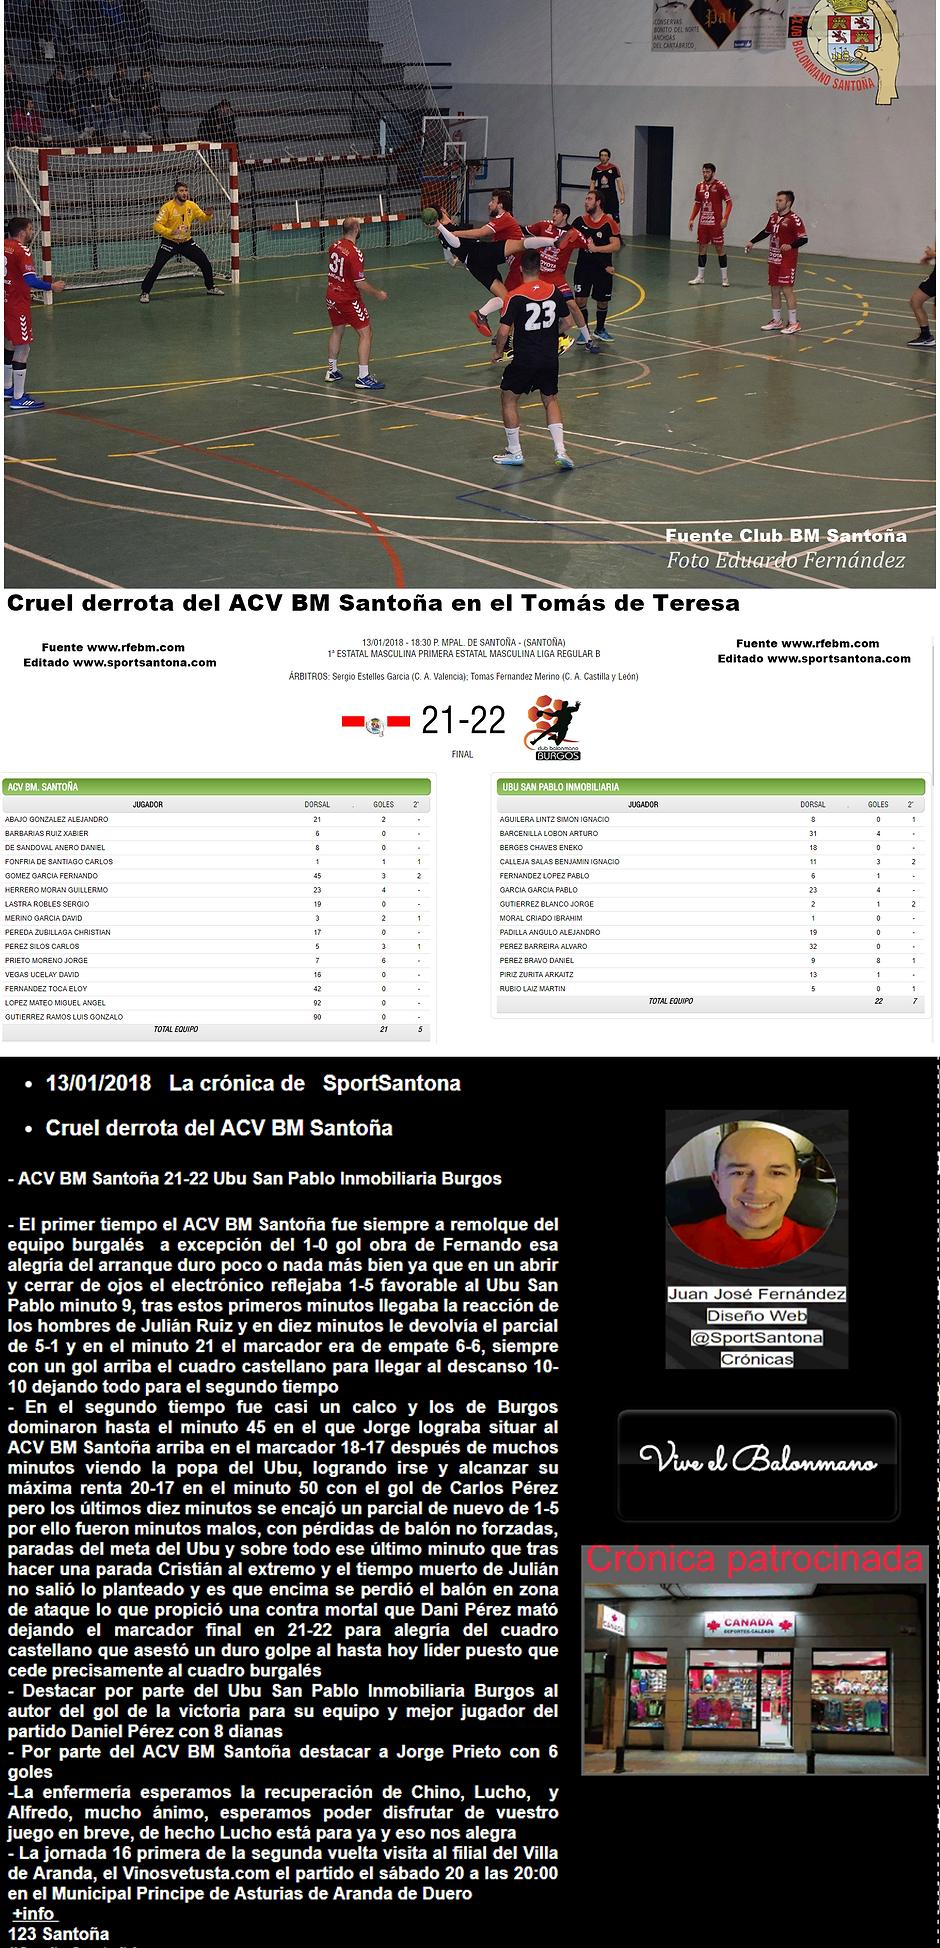 Crónica ACV BM Santoña 21-22 Ubu San Pablo